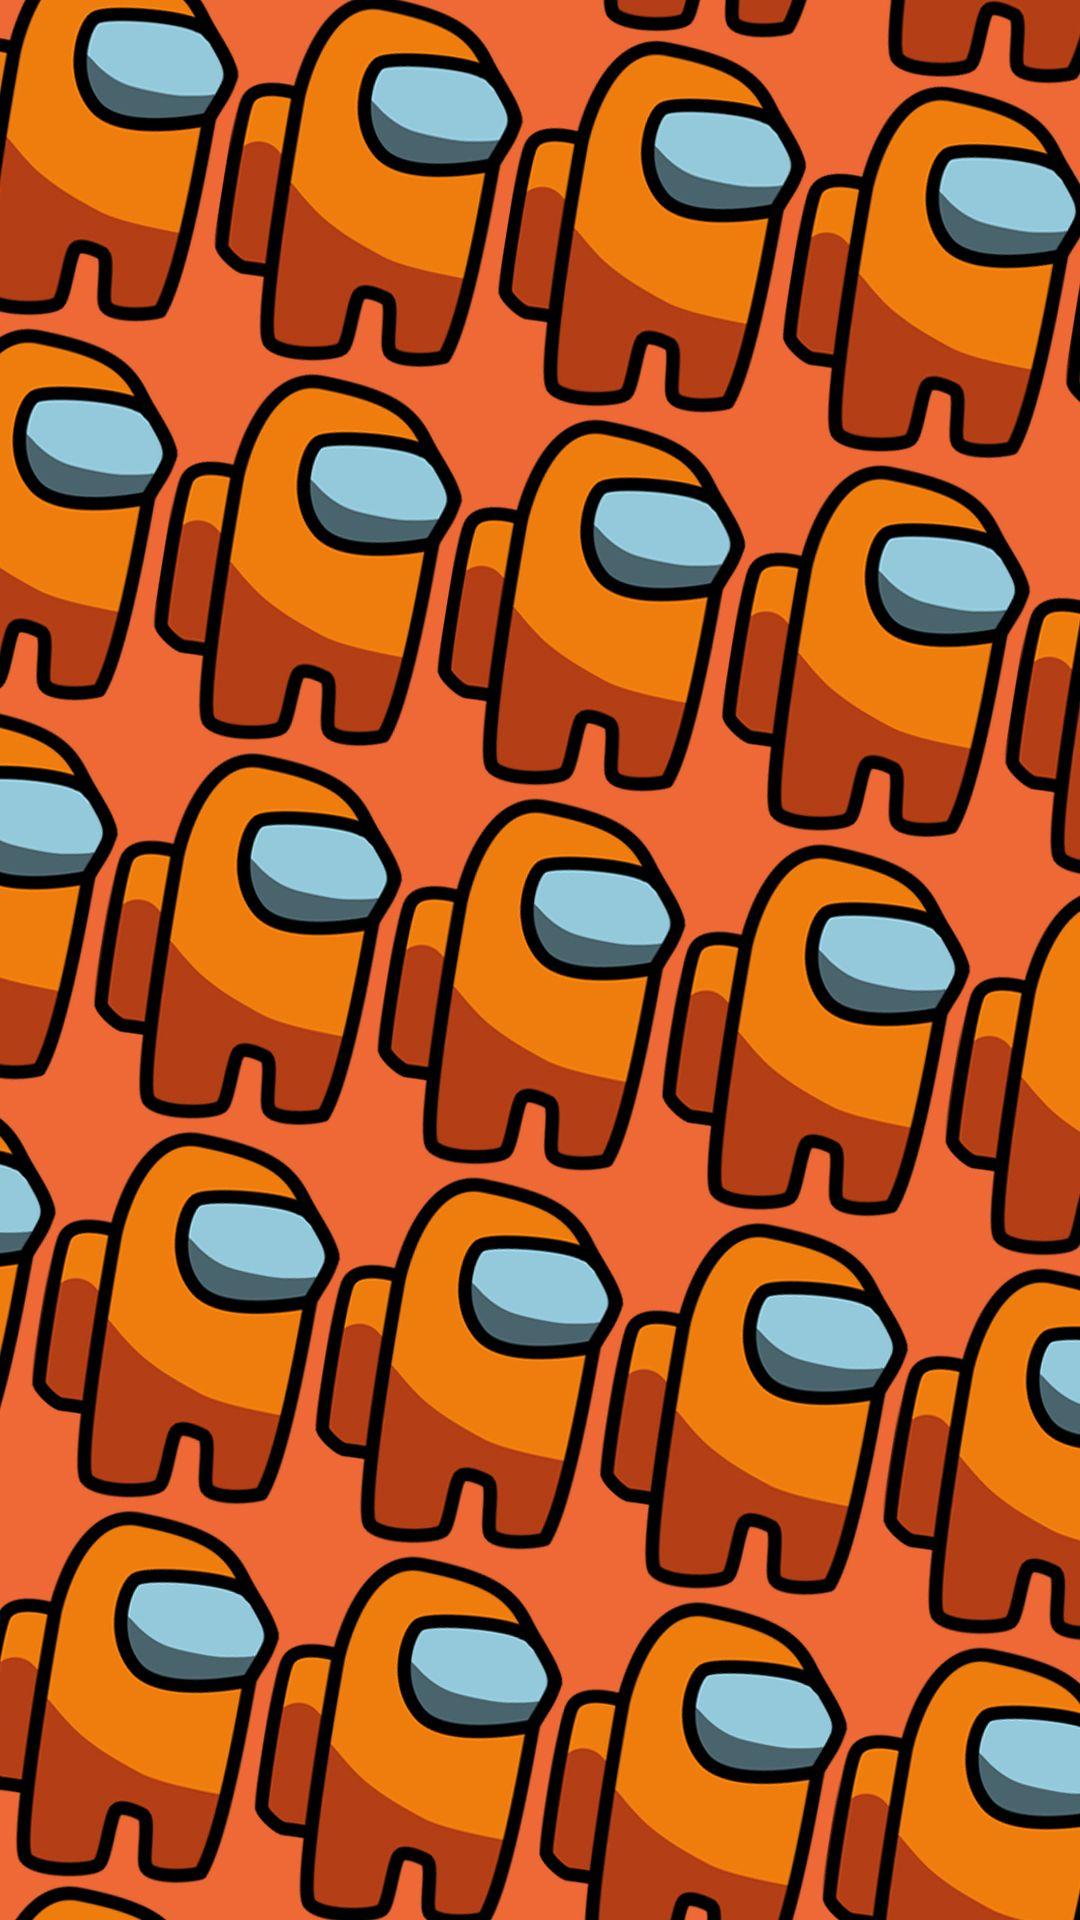 Orange Among Us Orange Aesthetic Iphone Wallpaper Orange Orange Wallpaper